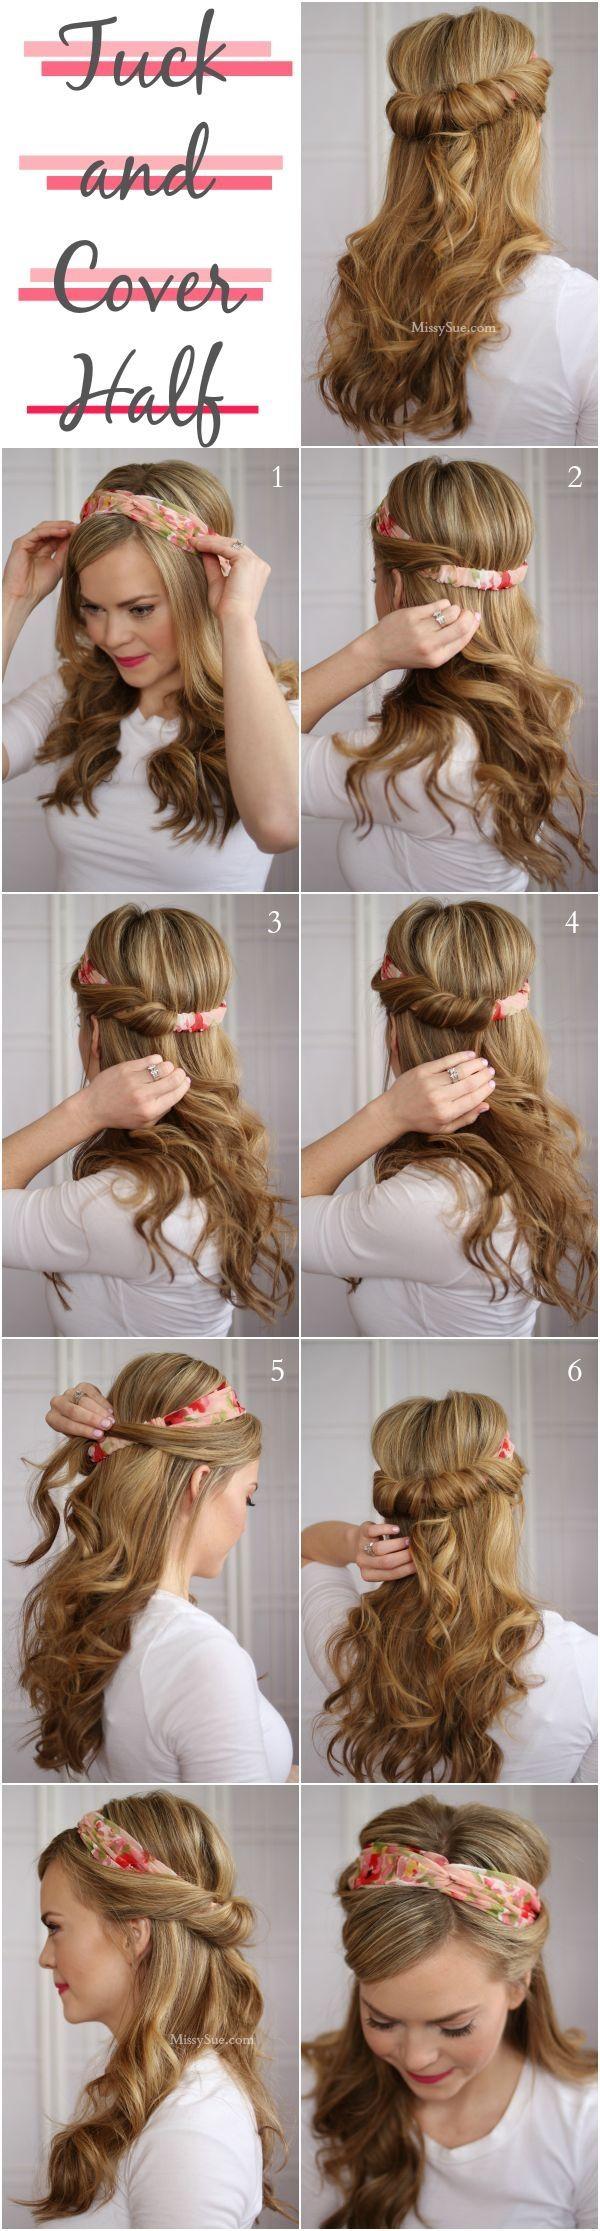 26 Lazy Girl HairstylingHacks | sooziQ